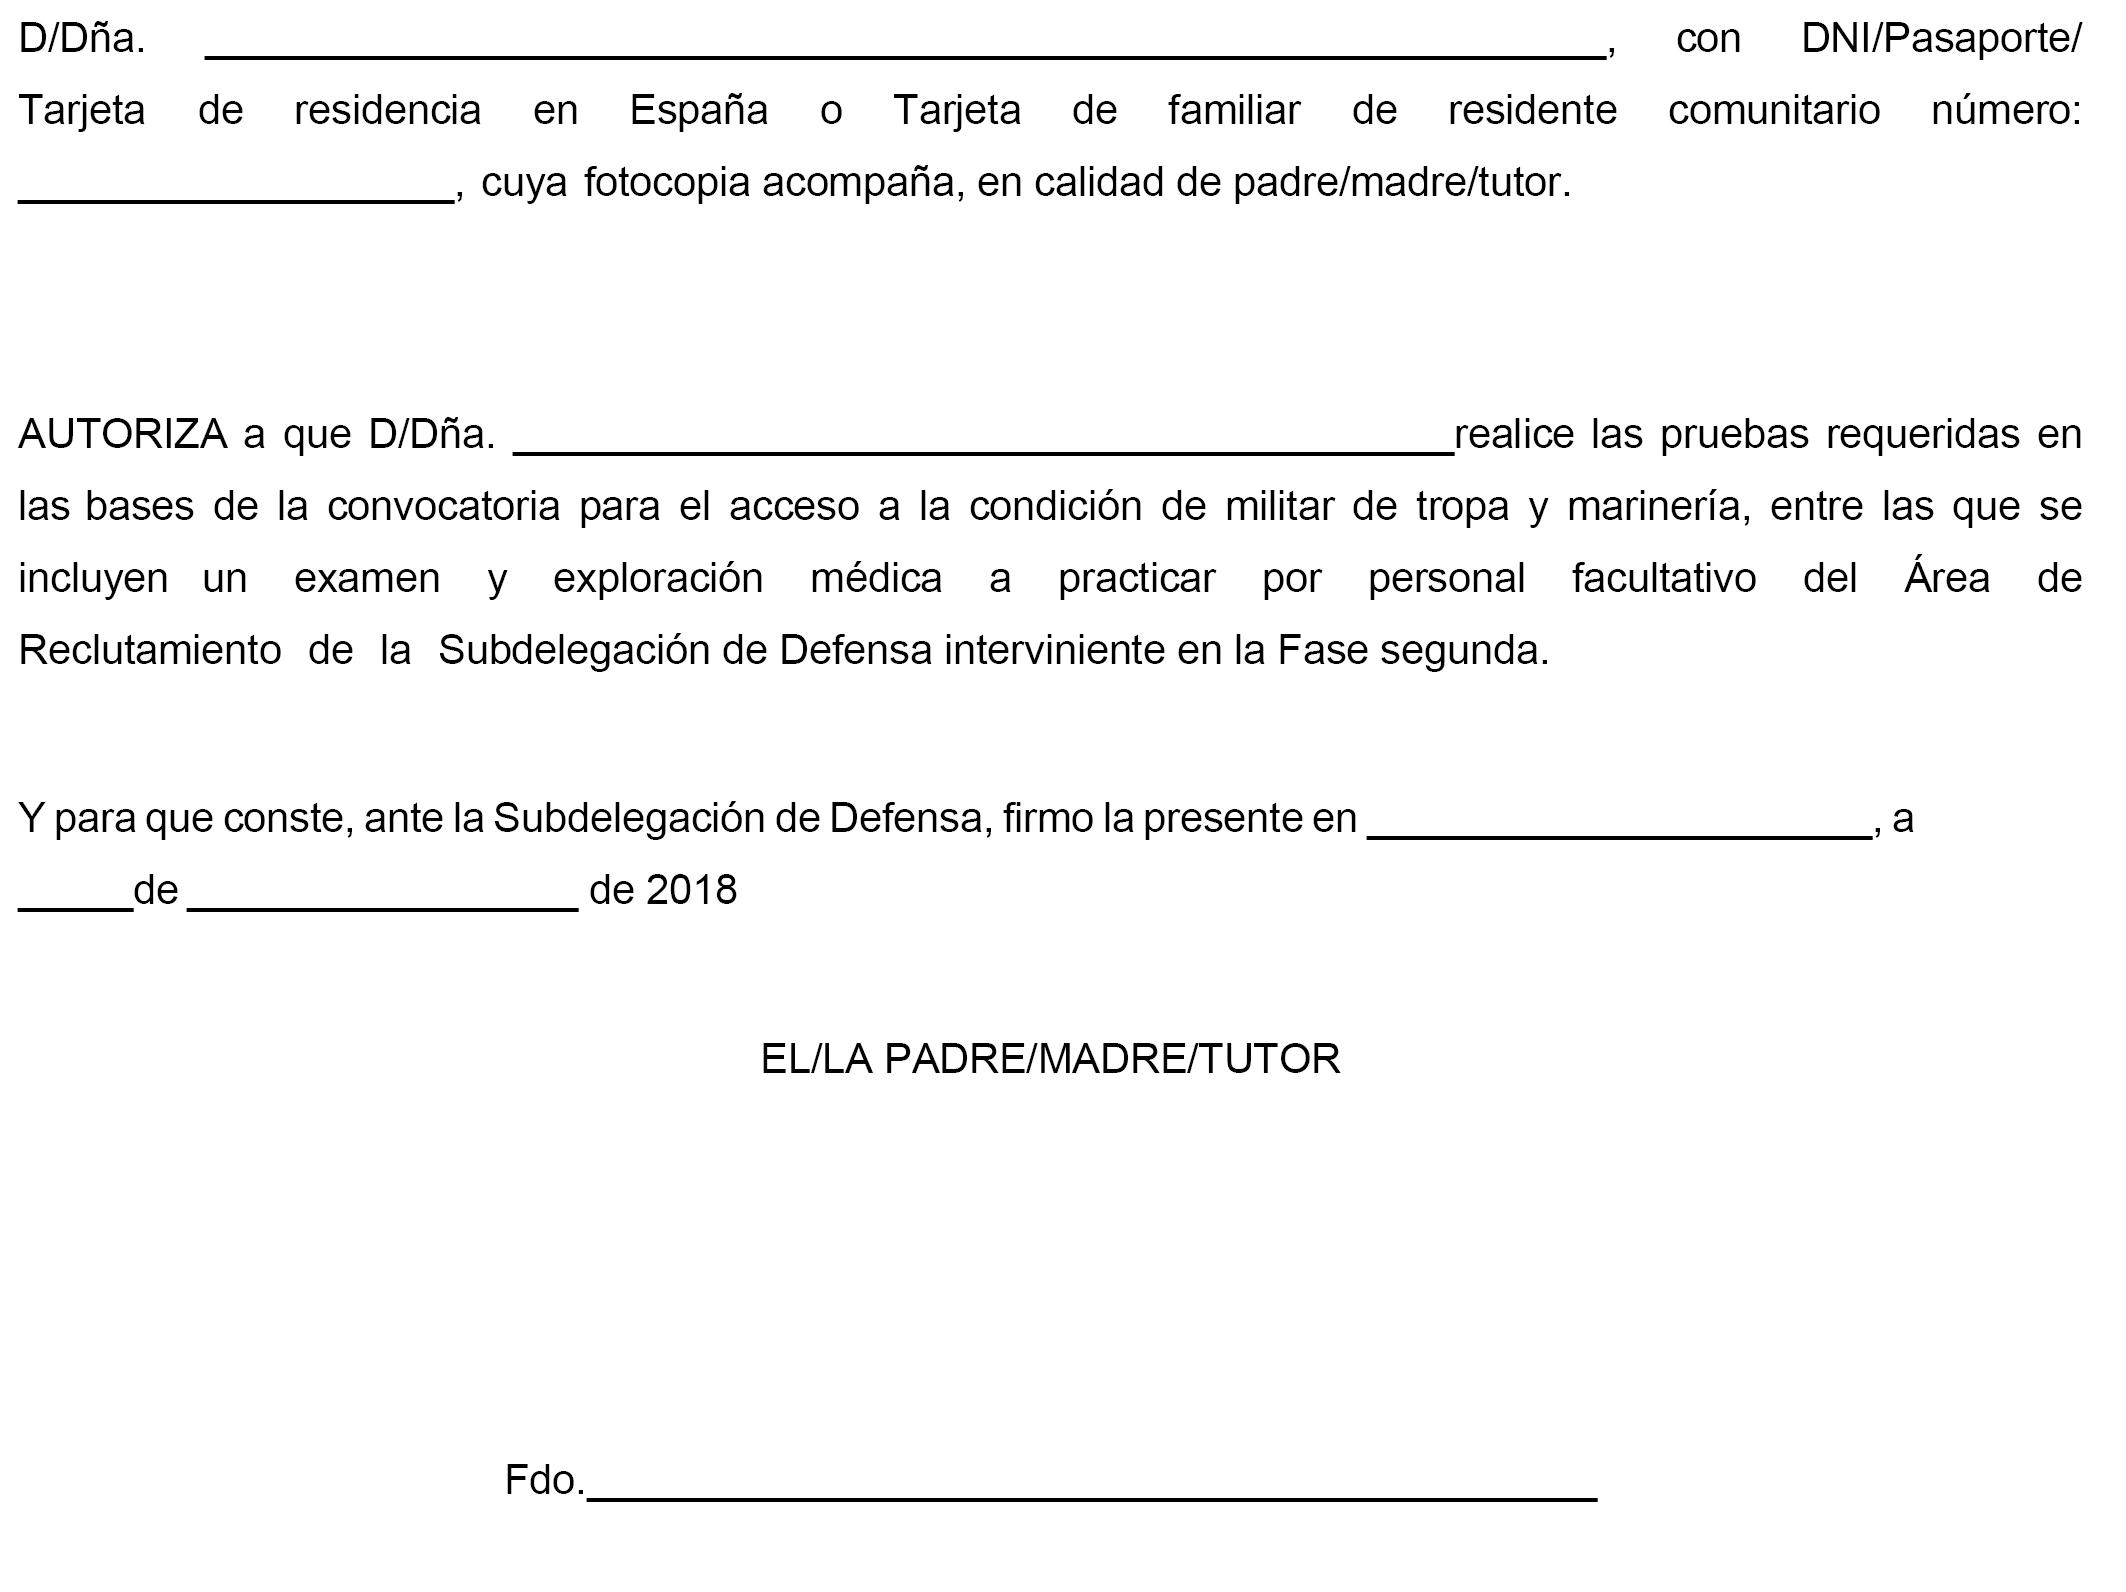 BOE.es - Documento BOE-A-2018-7794